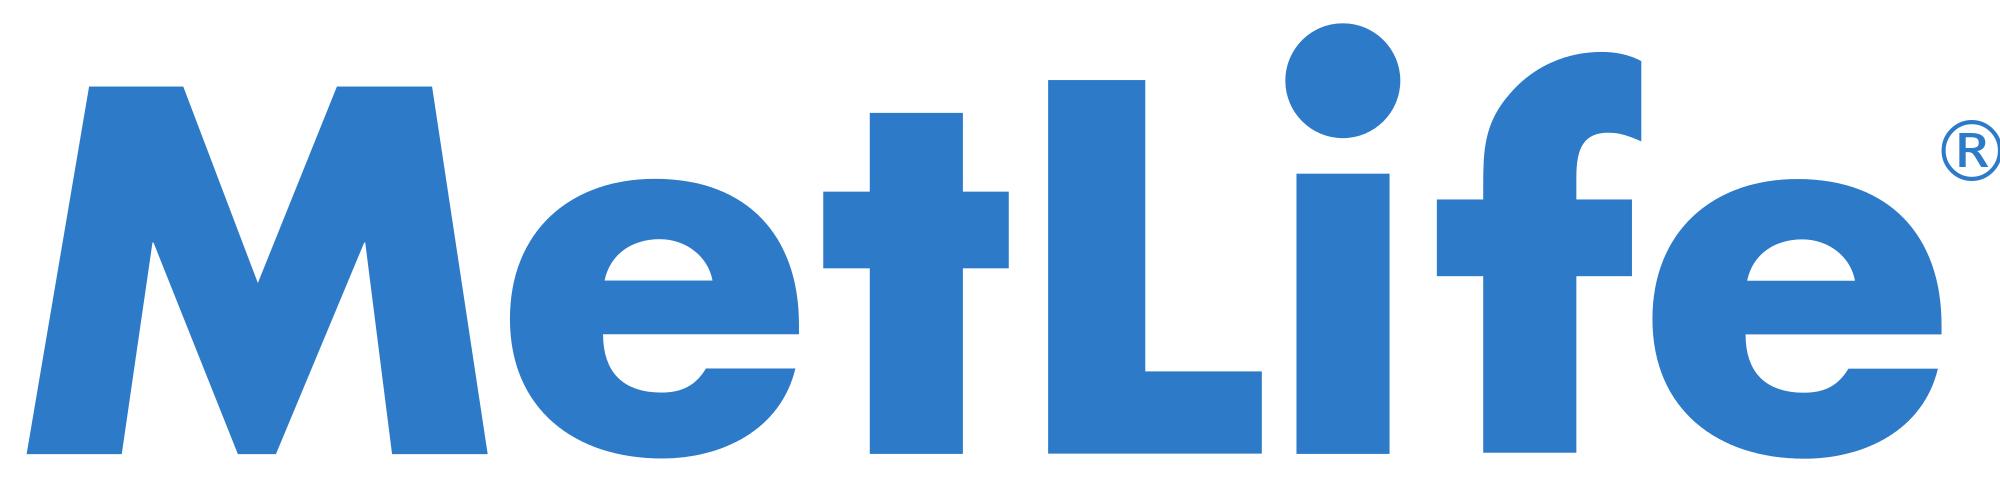 metlifelogo